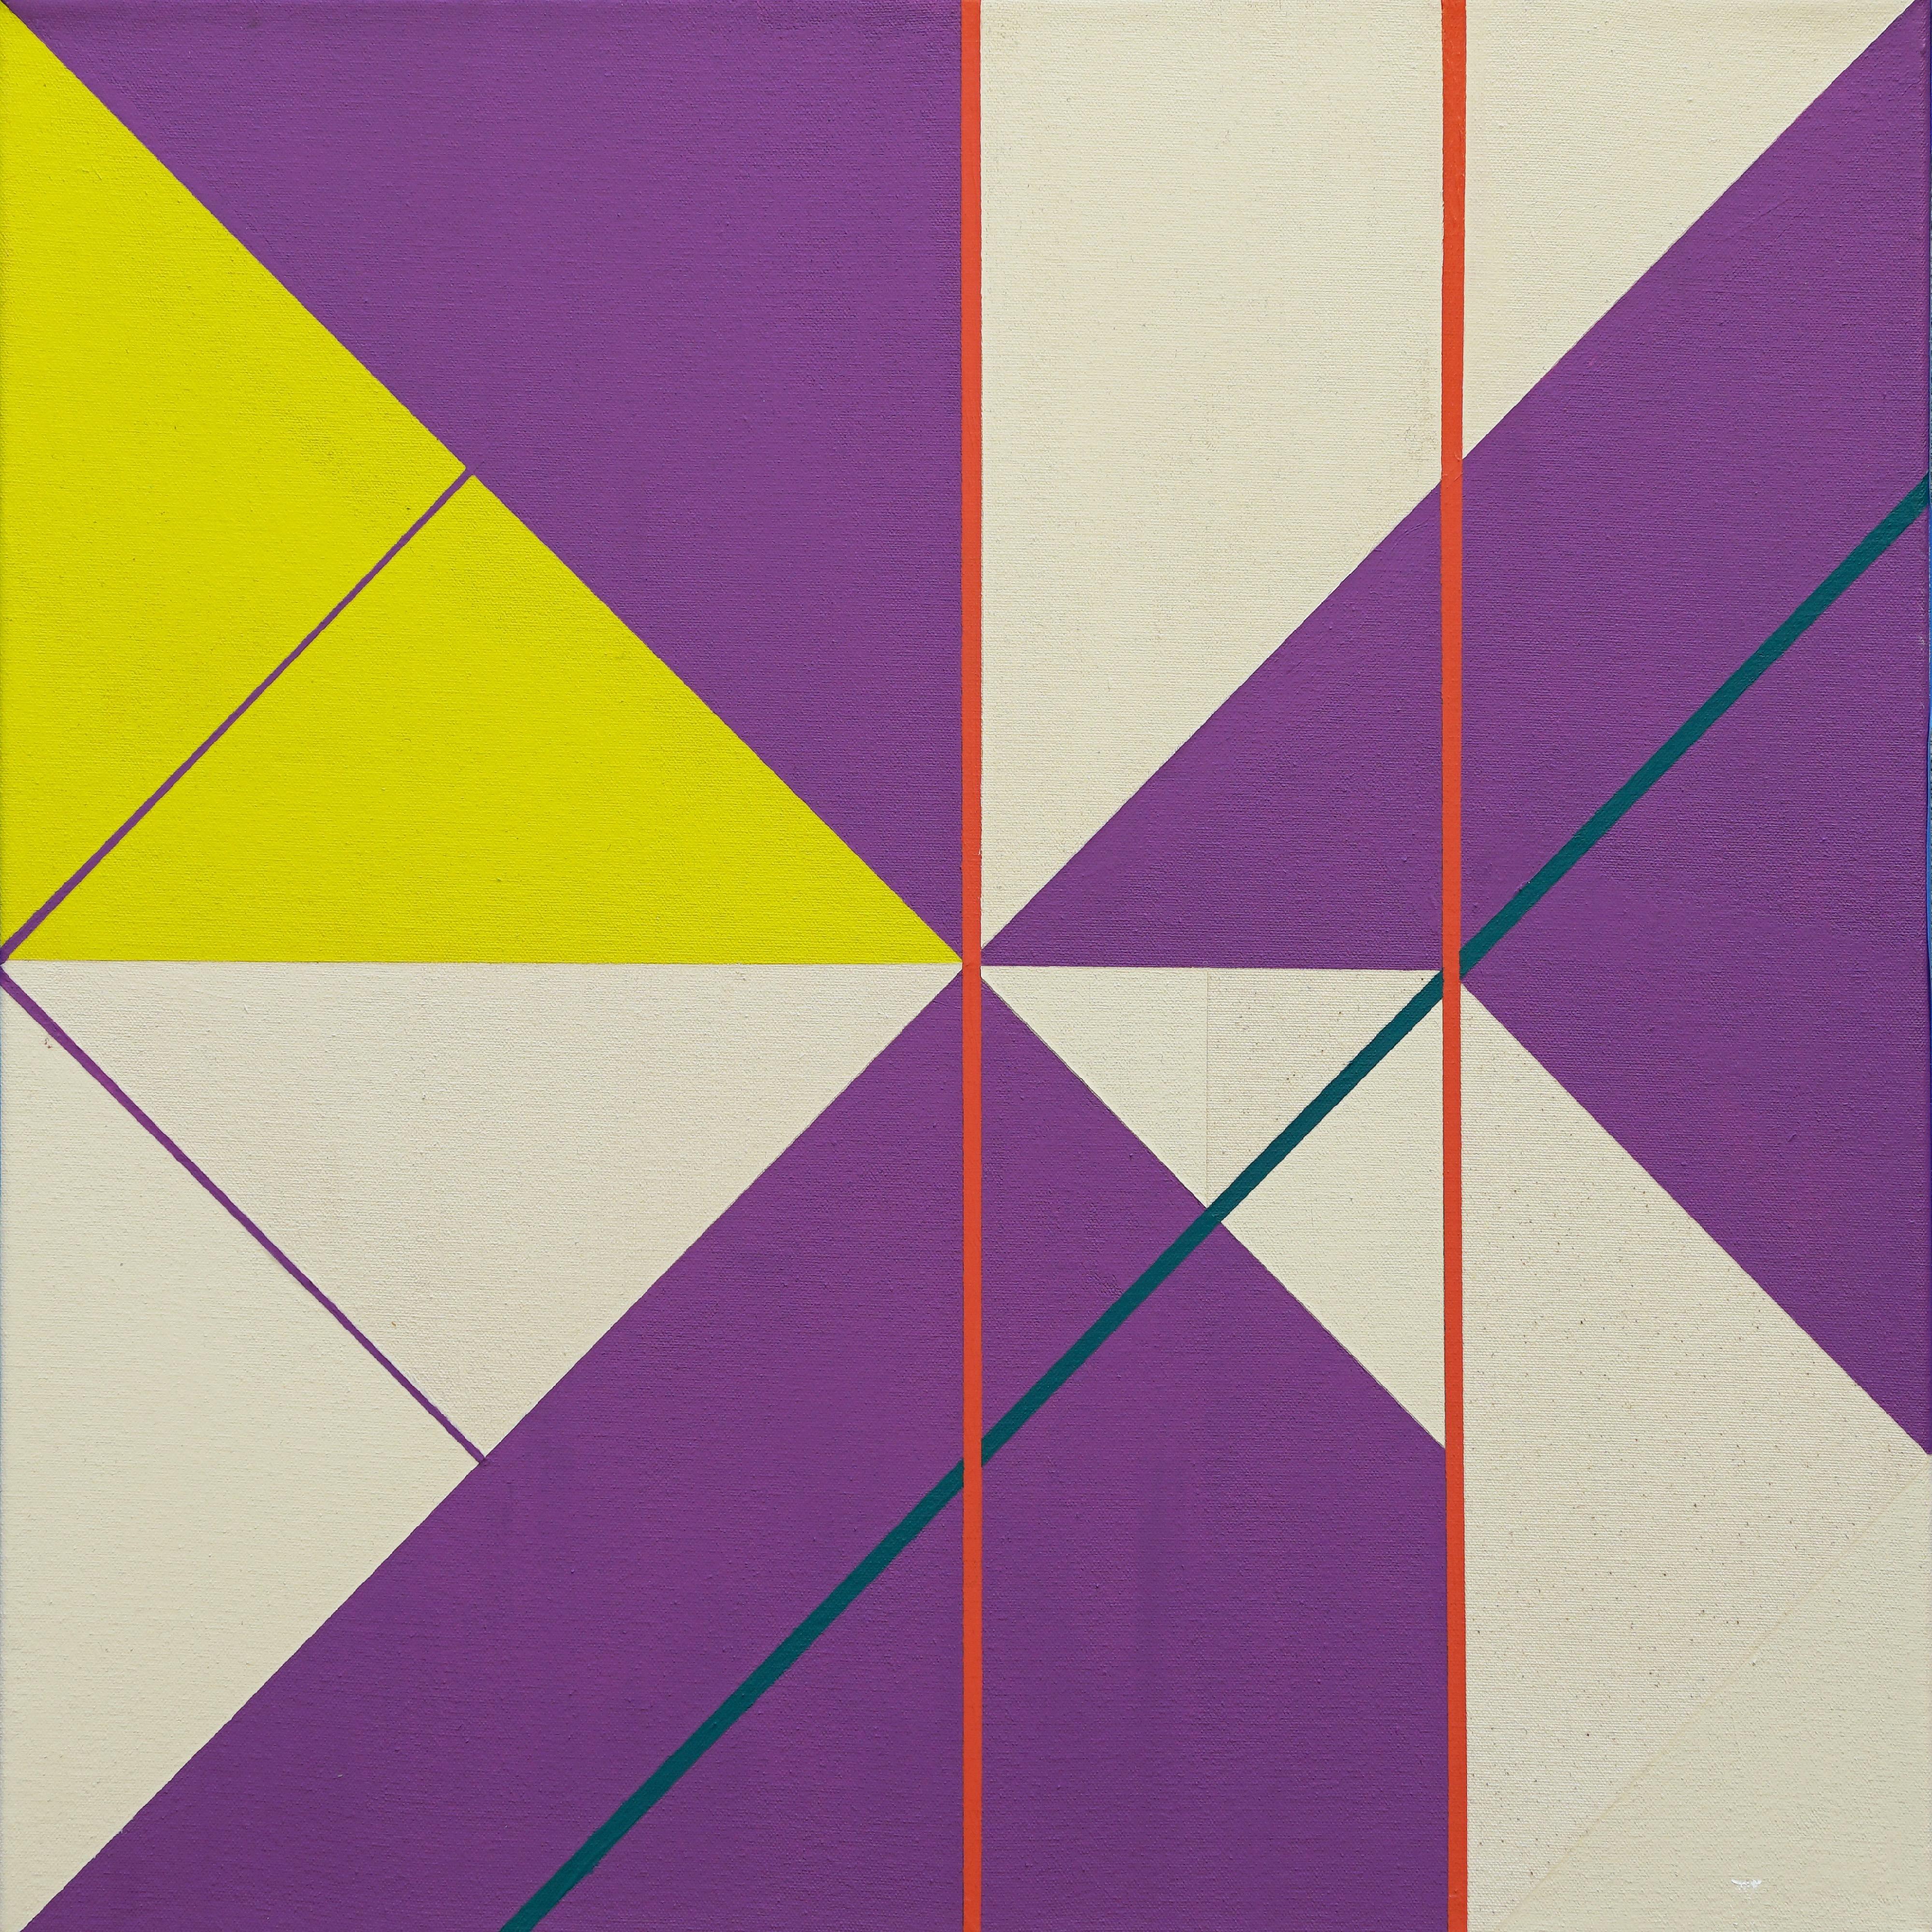 123 B by Tim McKay | ArtworkNetwork.com